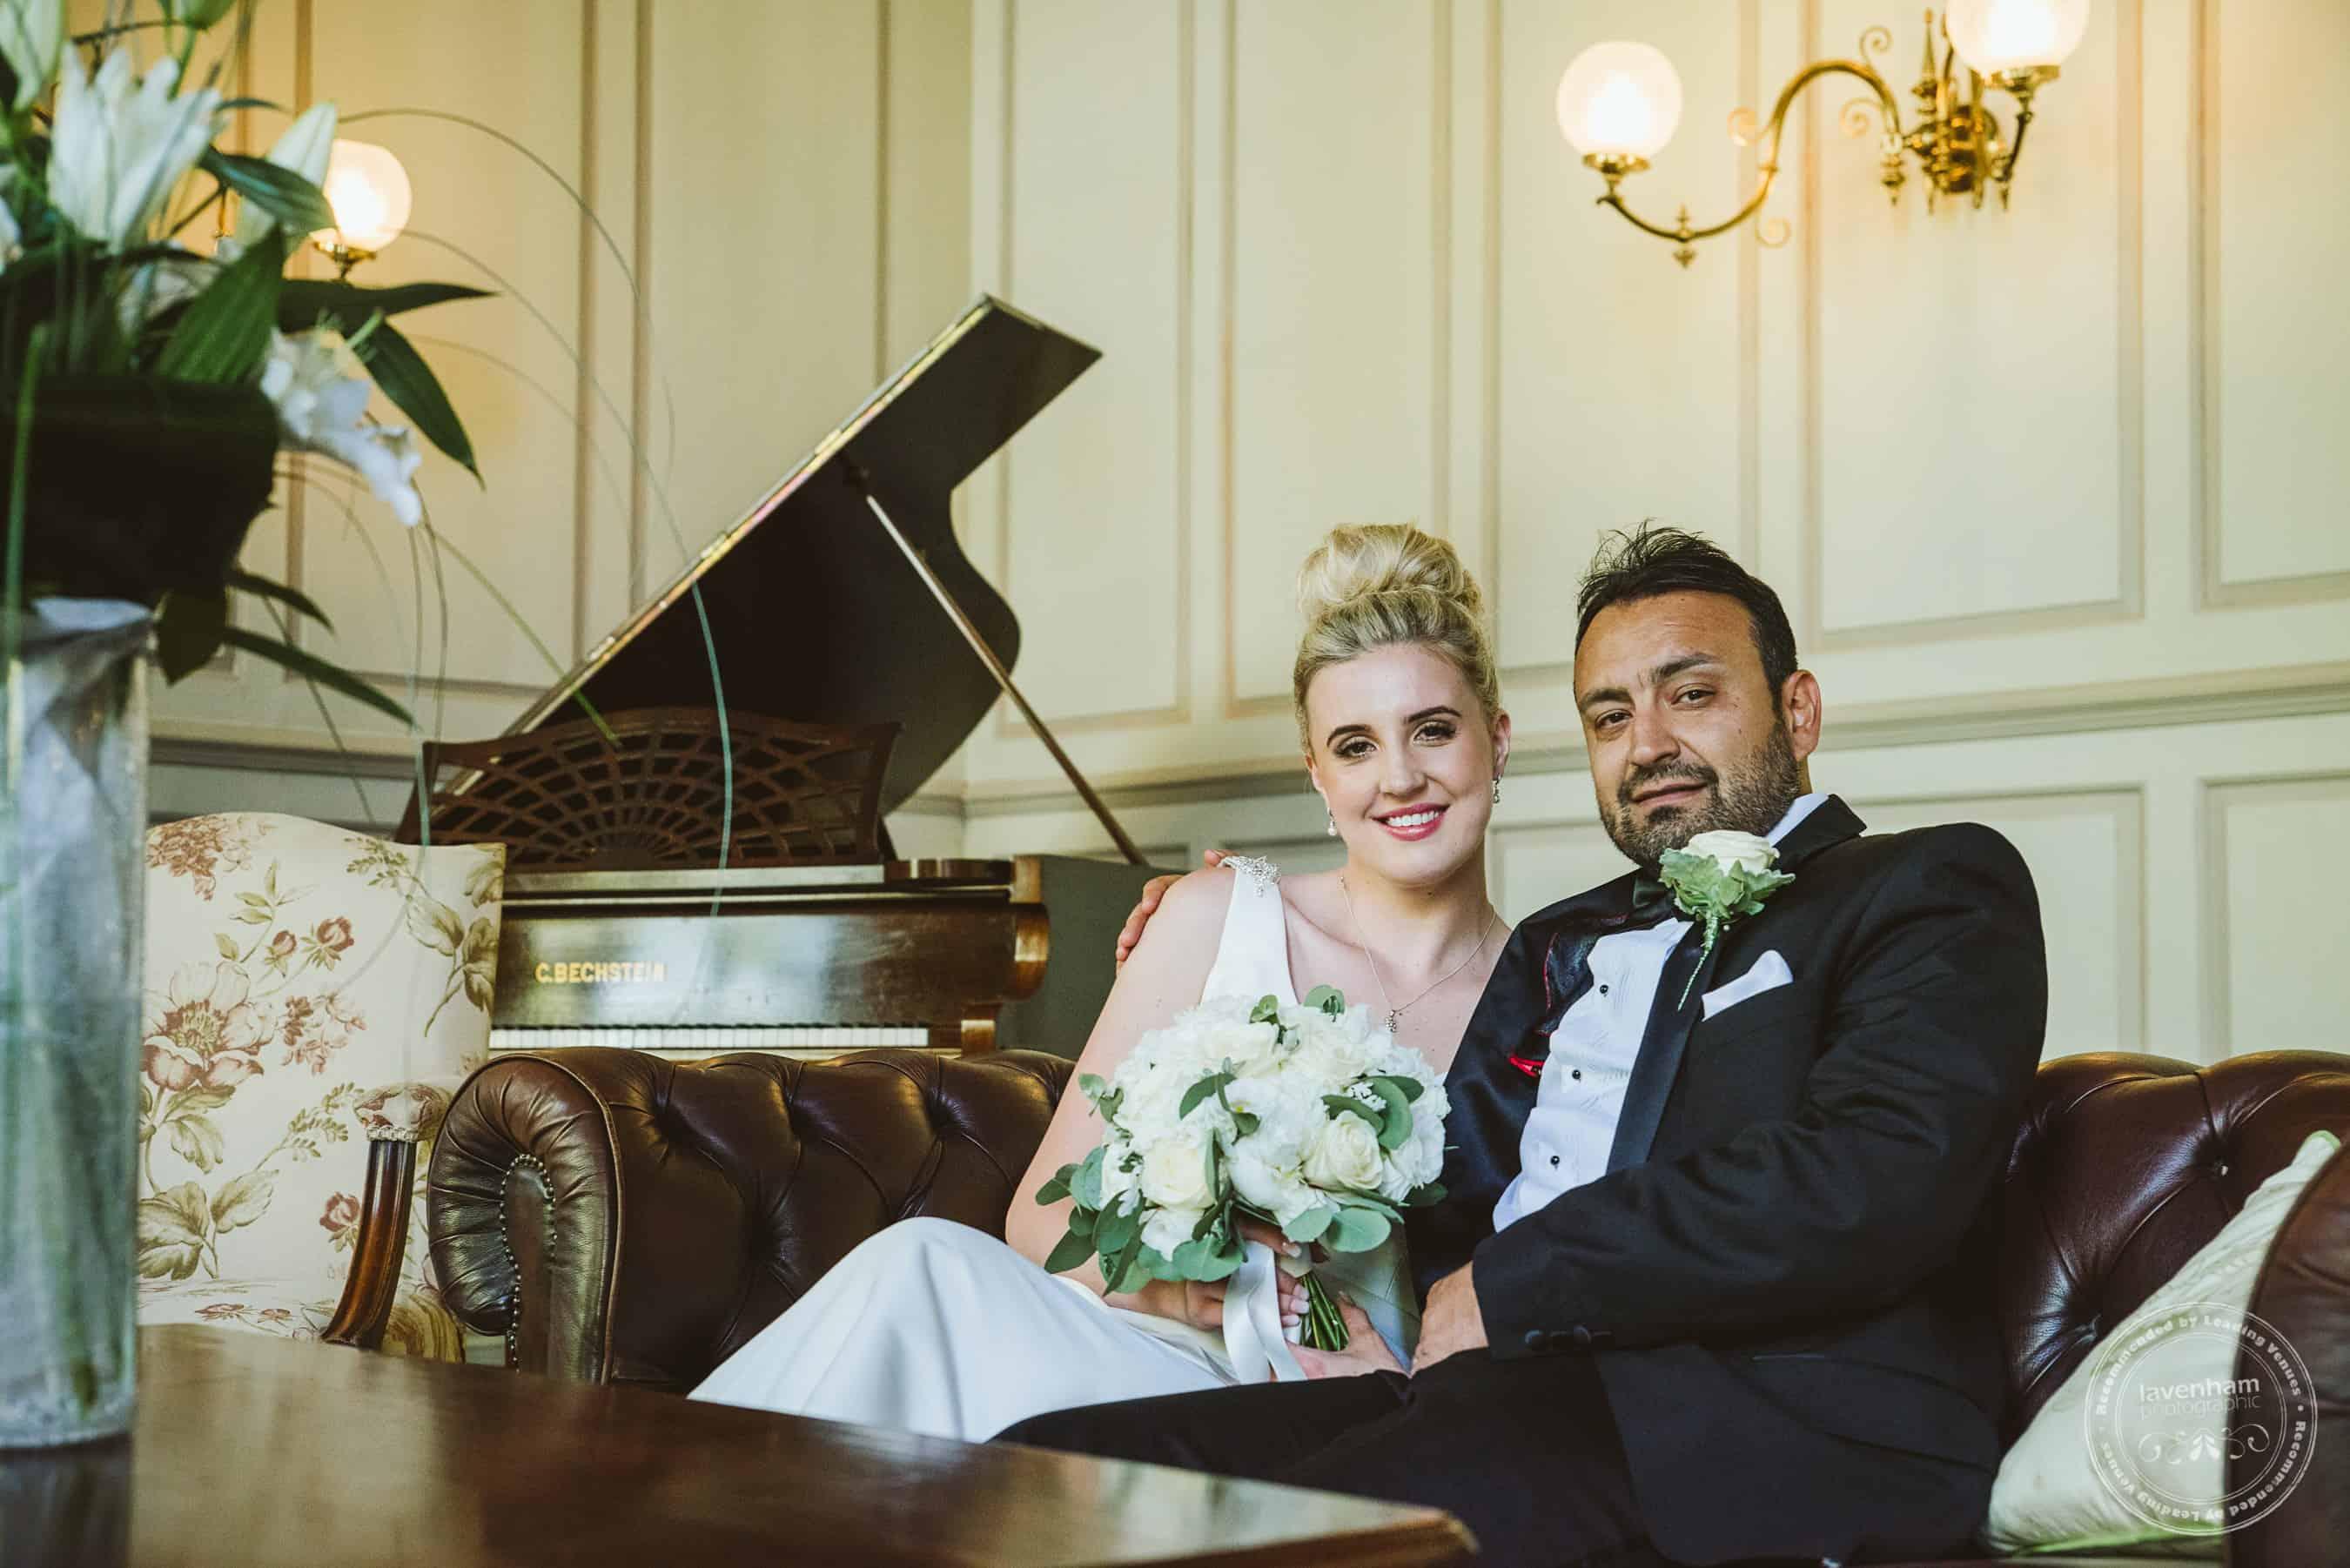 220618 Gosfield Hall Wedding Photography Lavenham Photographic 0161